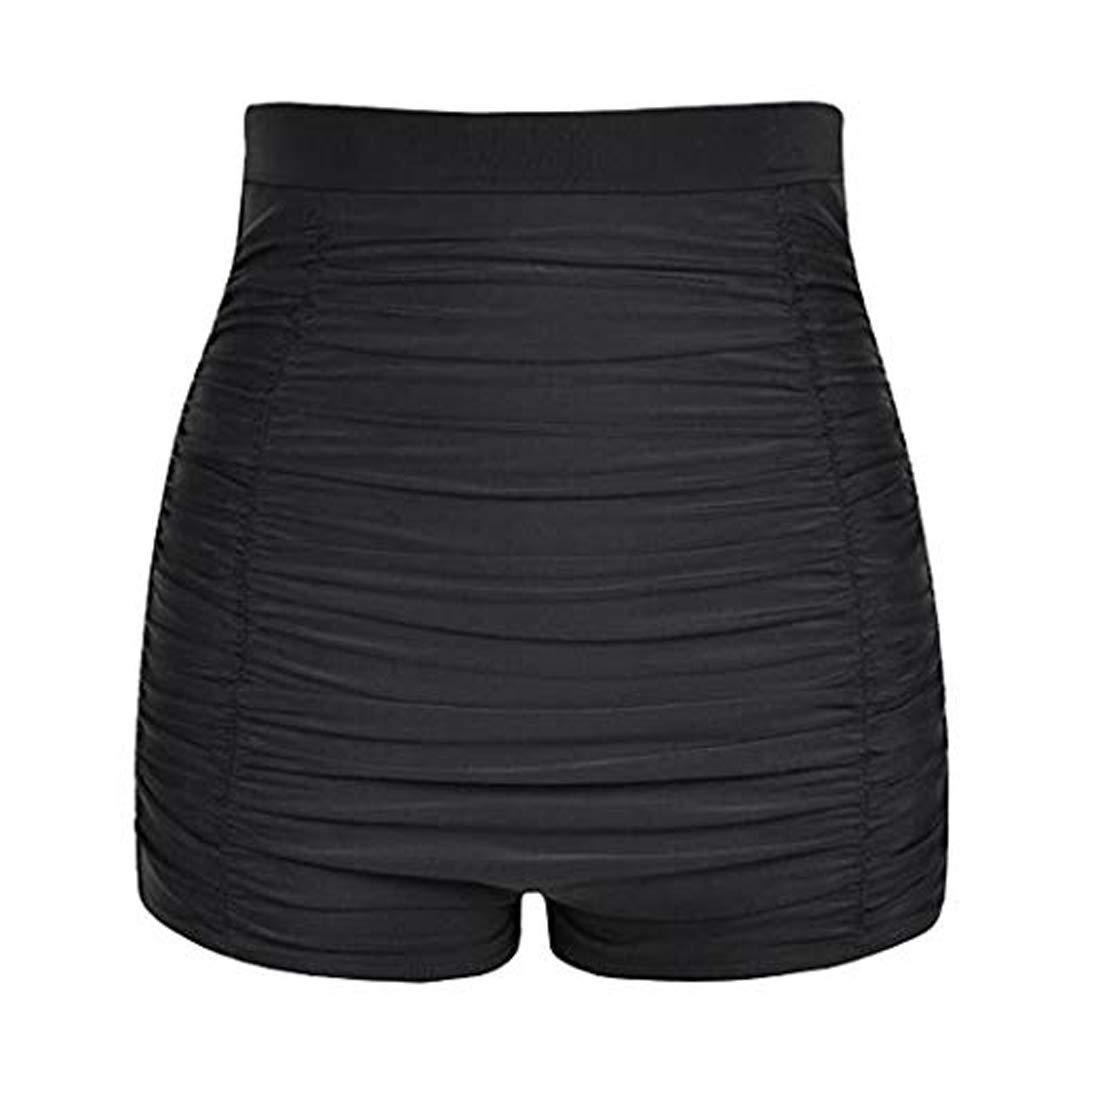 Viloree Damen hohe Taille Bikini Unterteil Badehose Tankinihose Hotpants Bauch Weg Schwarz UhWqYoby Schlussverkauf